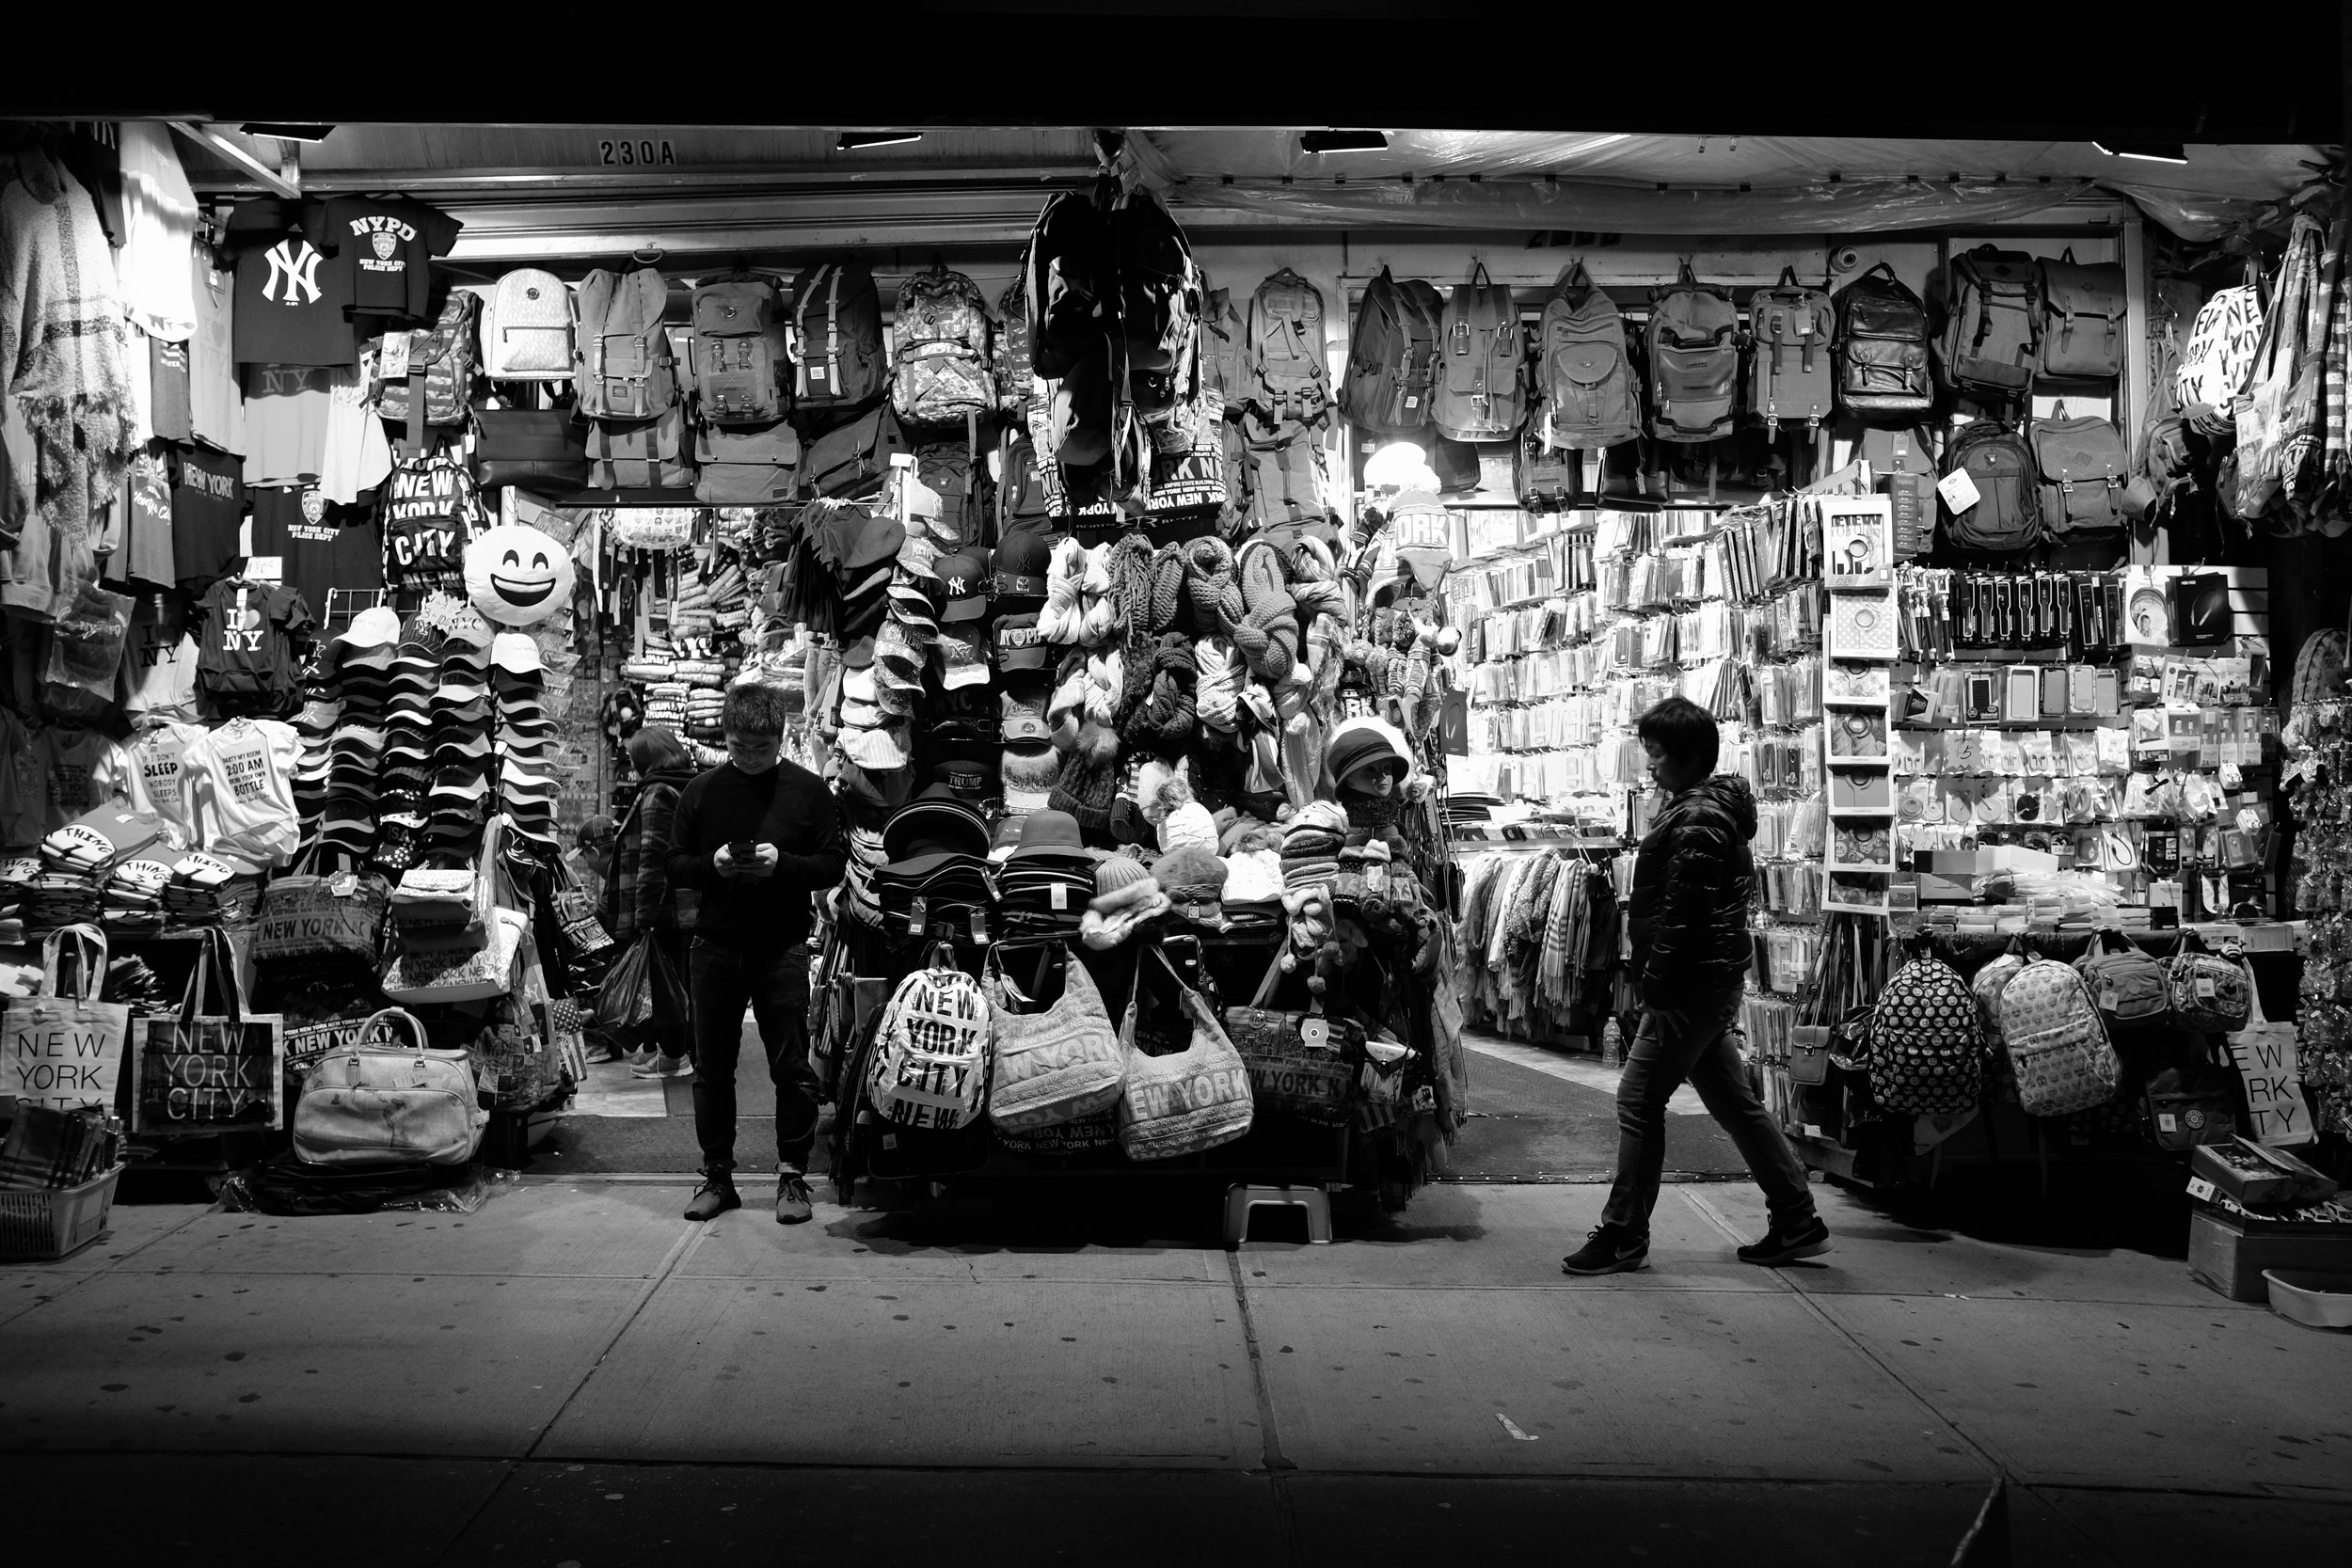 Canal Street. Chinatown. New York City. 2016.